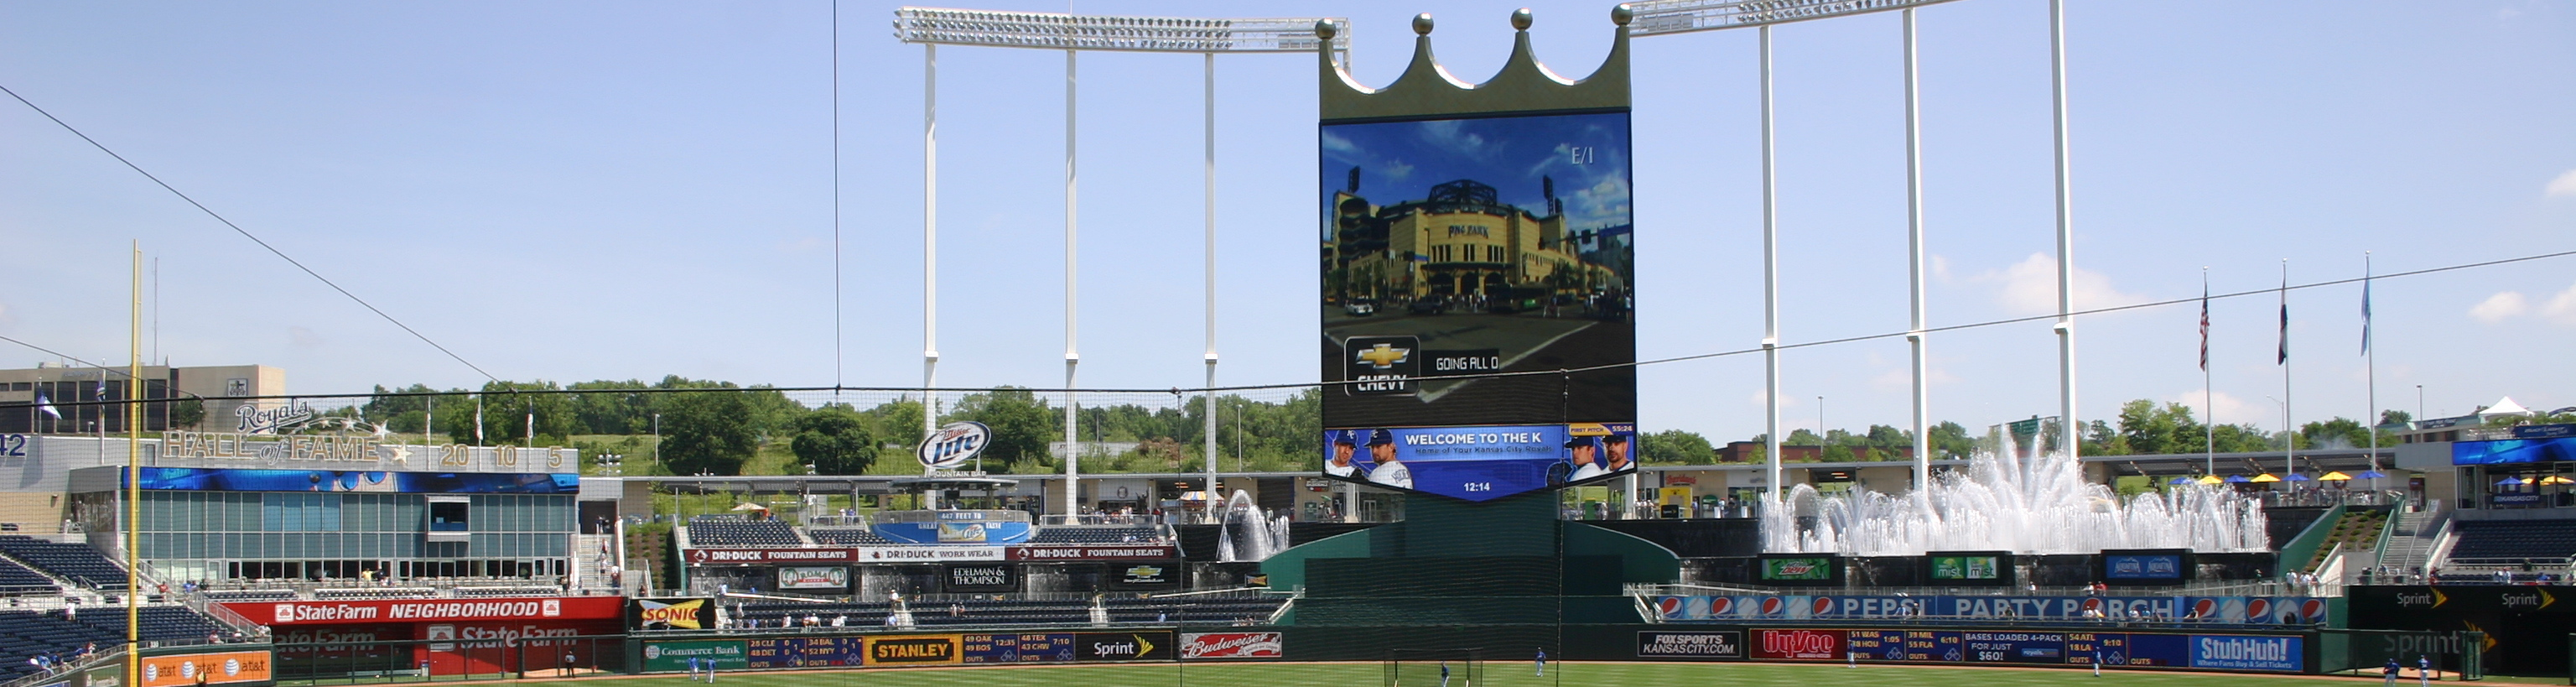 Royals Baseball Stadium Tours